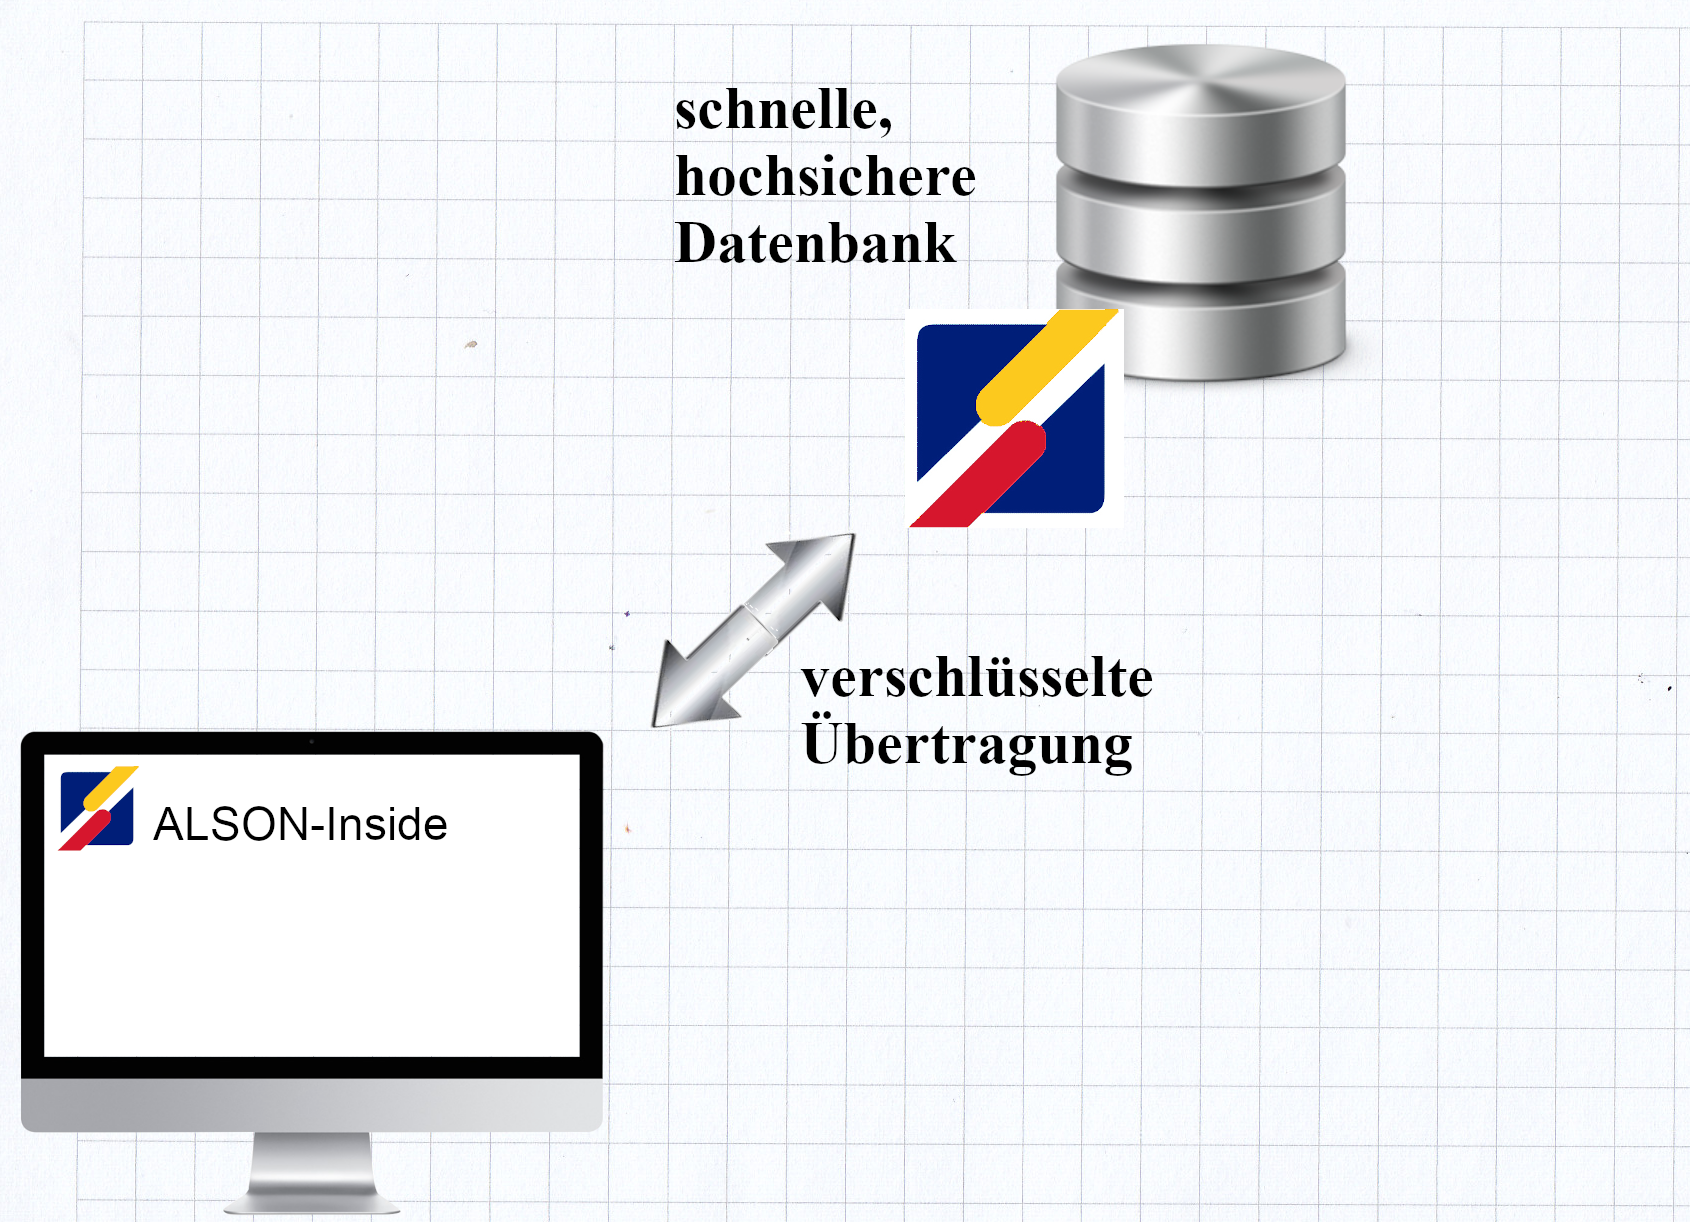 sichere Datenbank